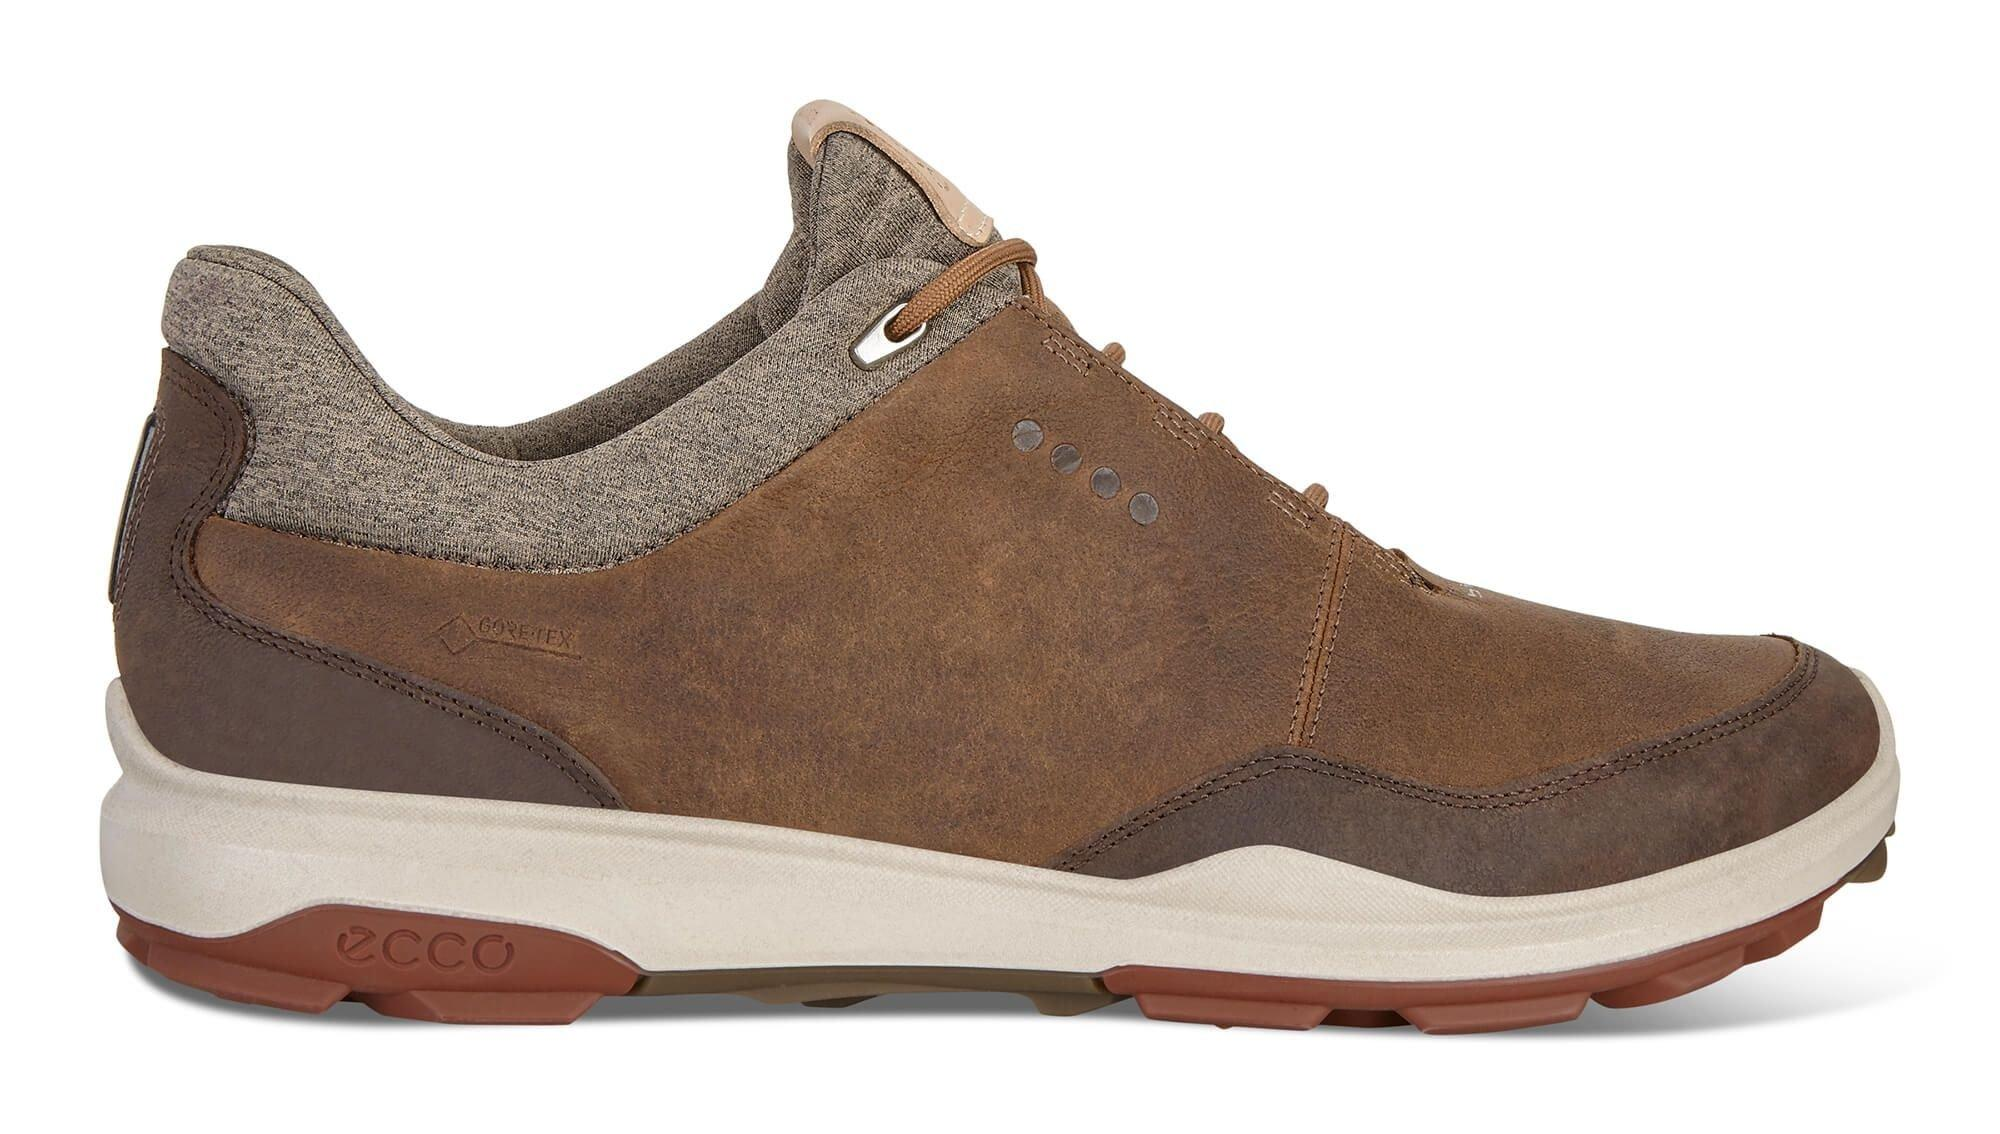 Ecco Biom Hybrid 3 Gtx Golf Shoes Camel Carl S Golfland